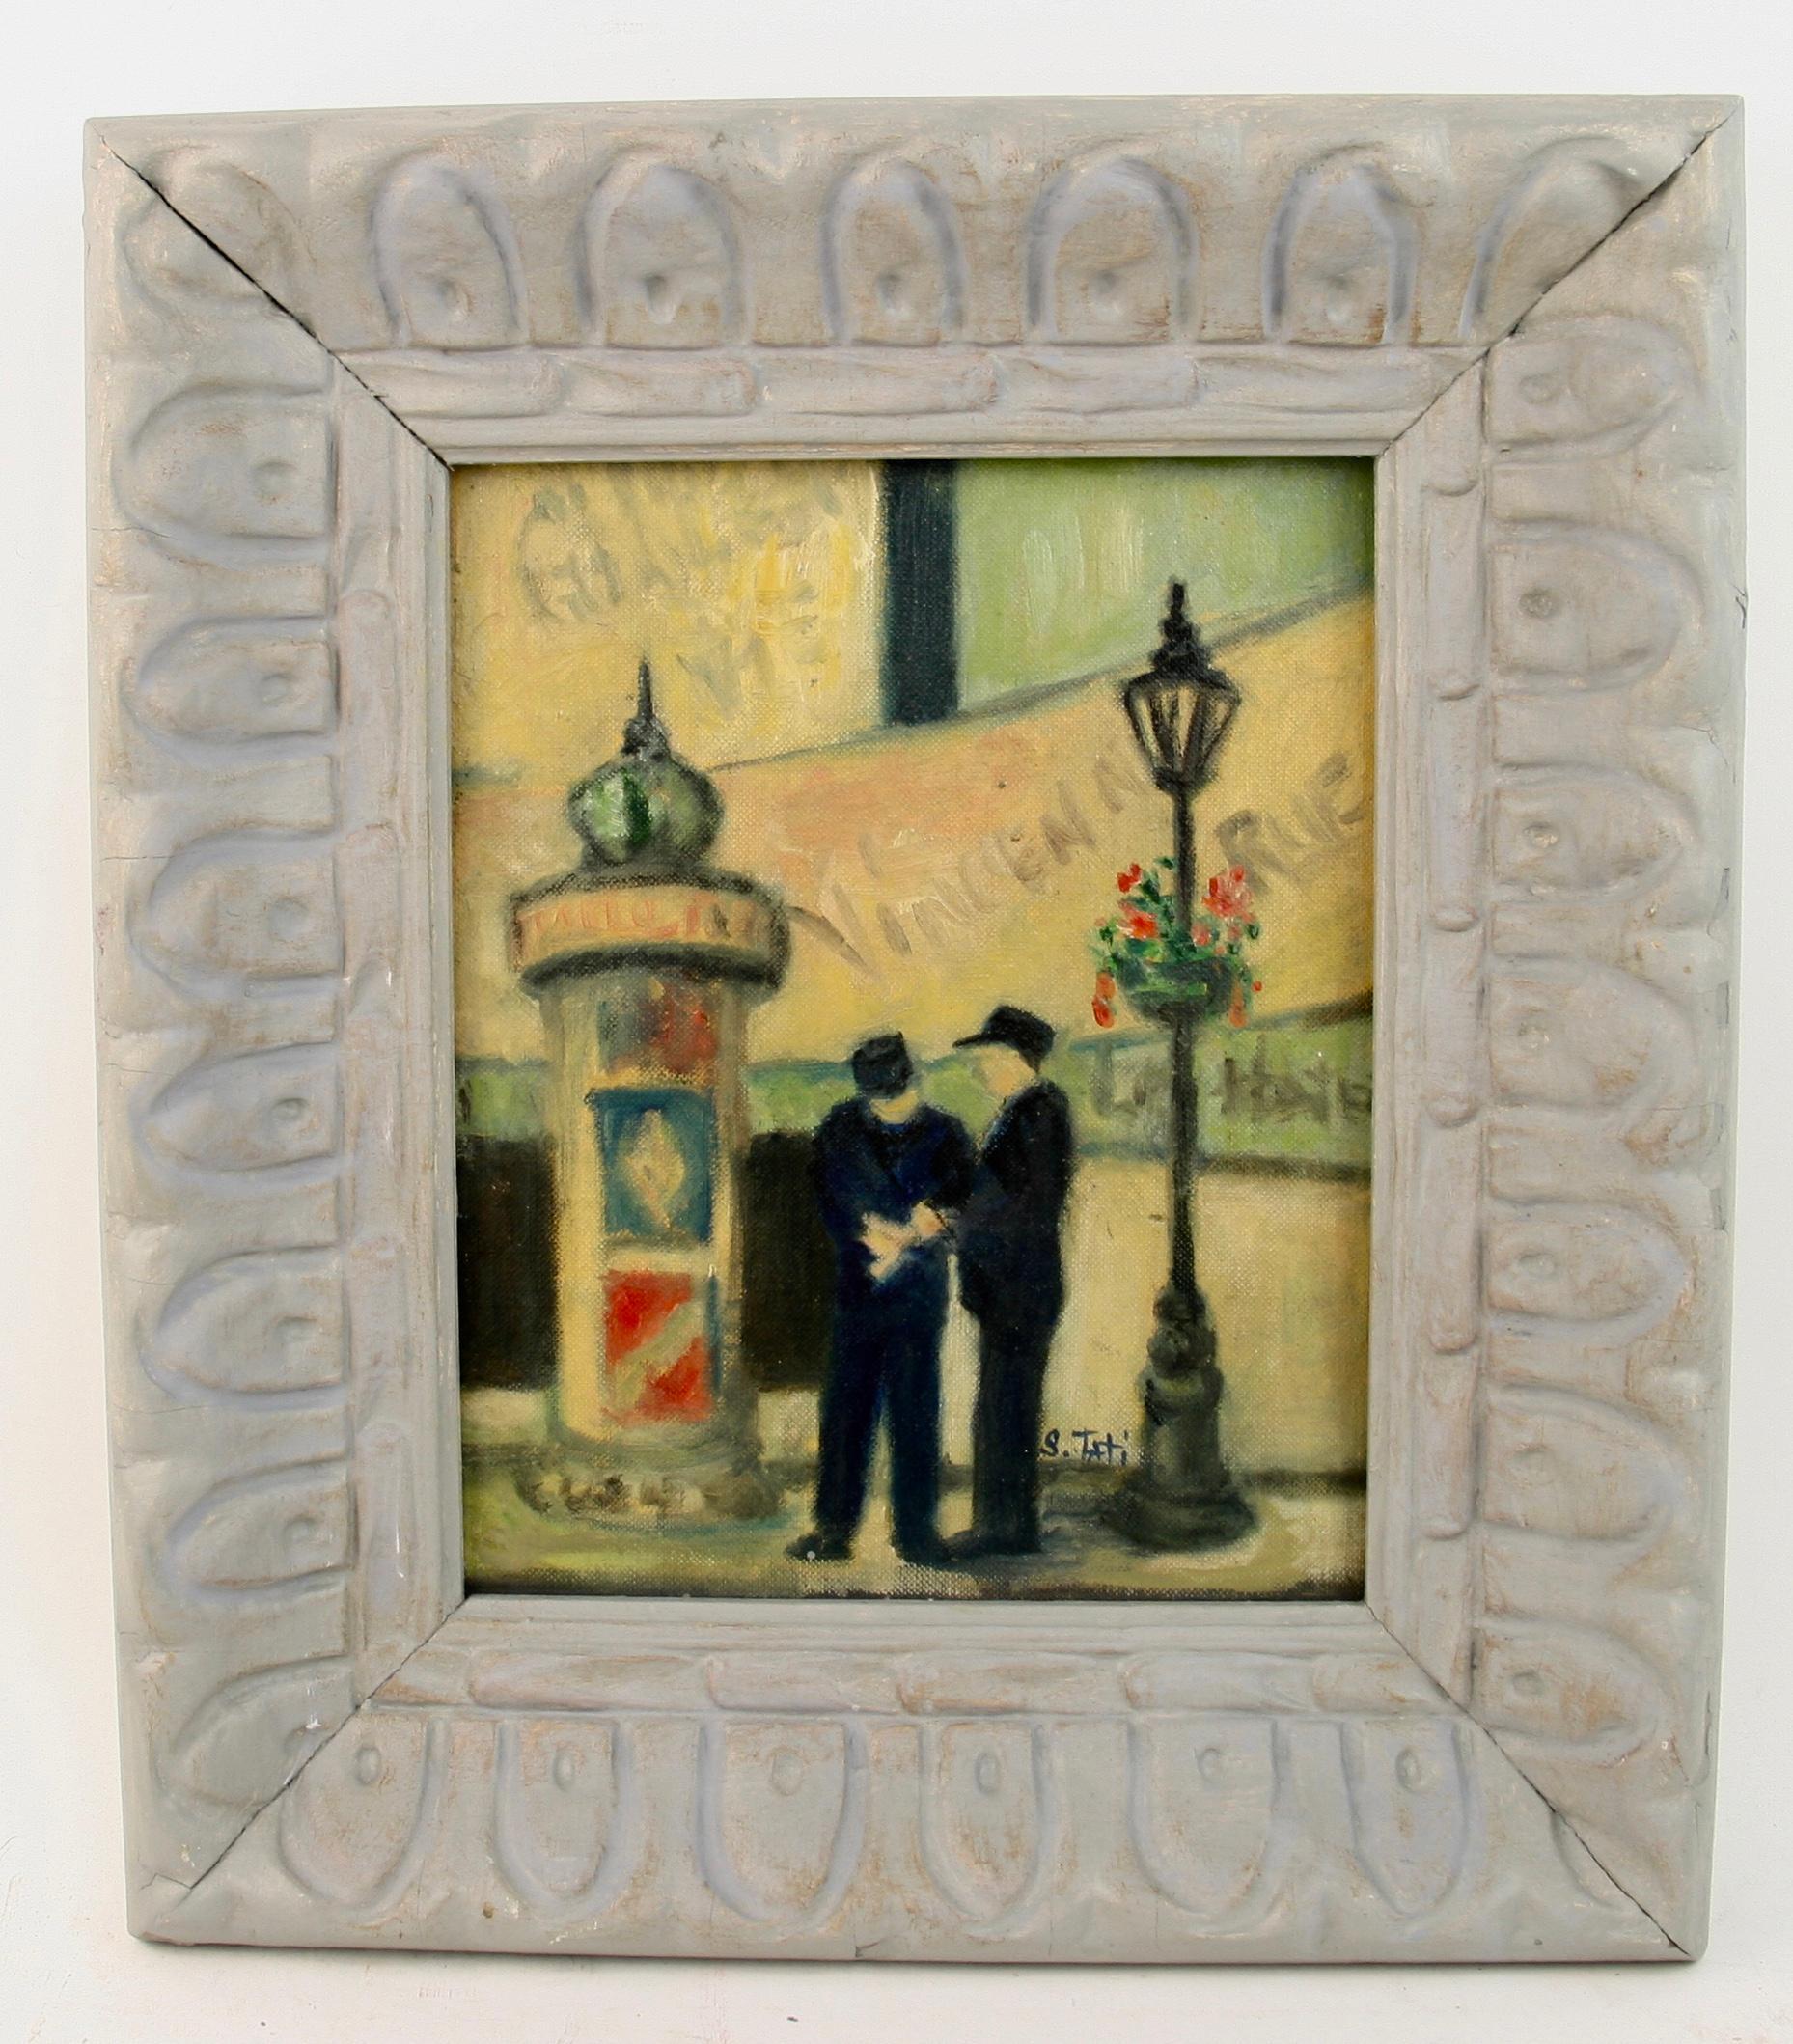 Impressionist French Old  Paris Figurative Street Landscape